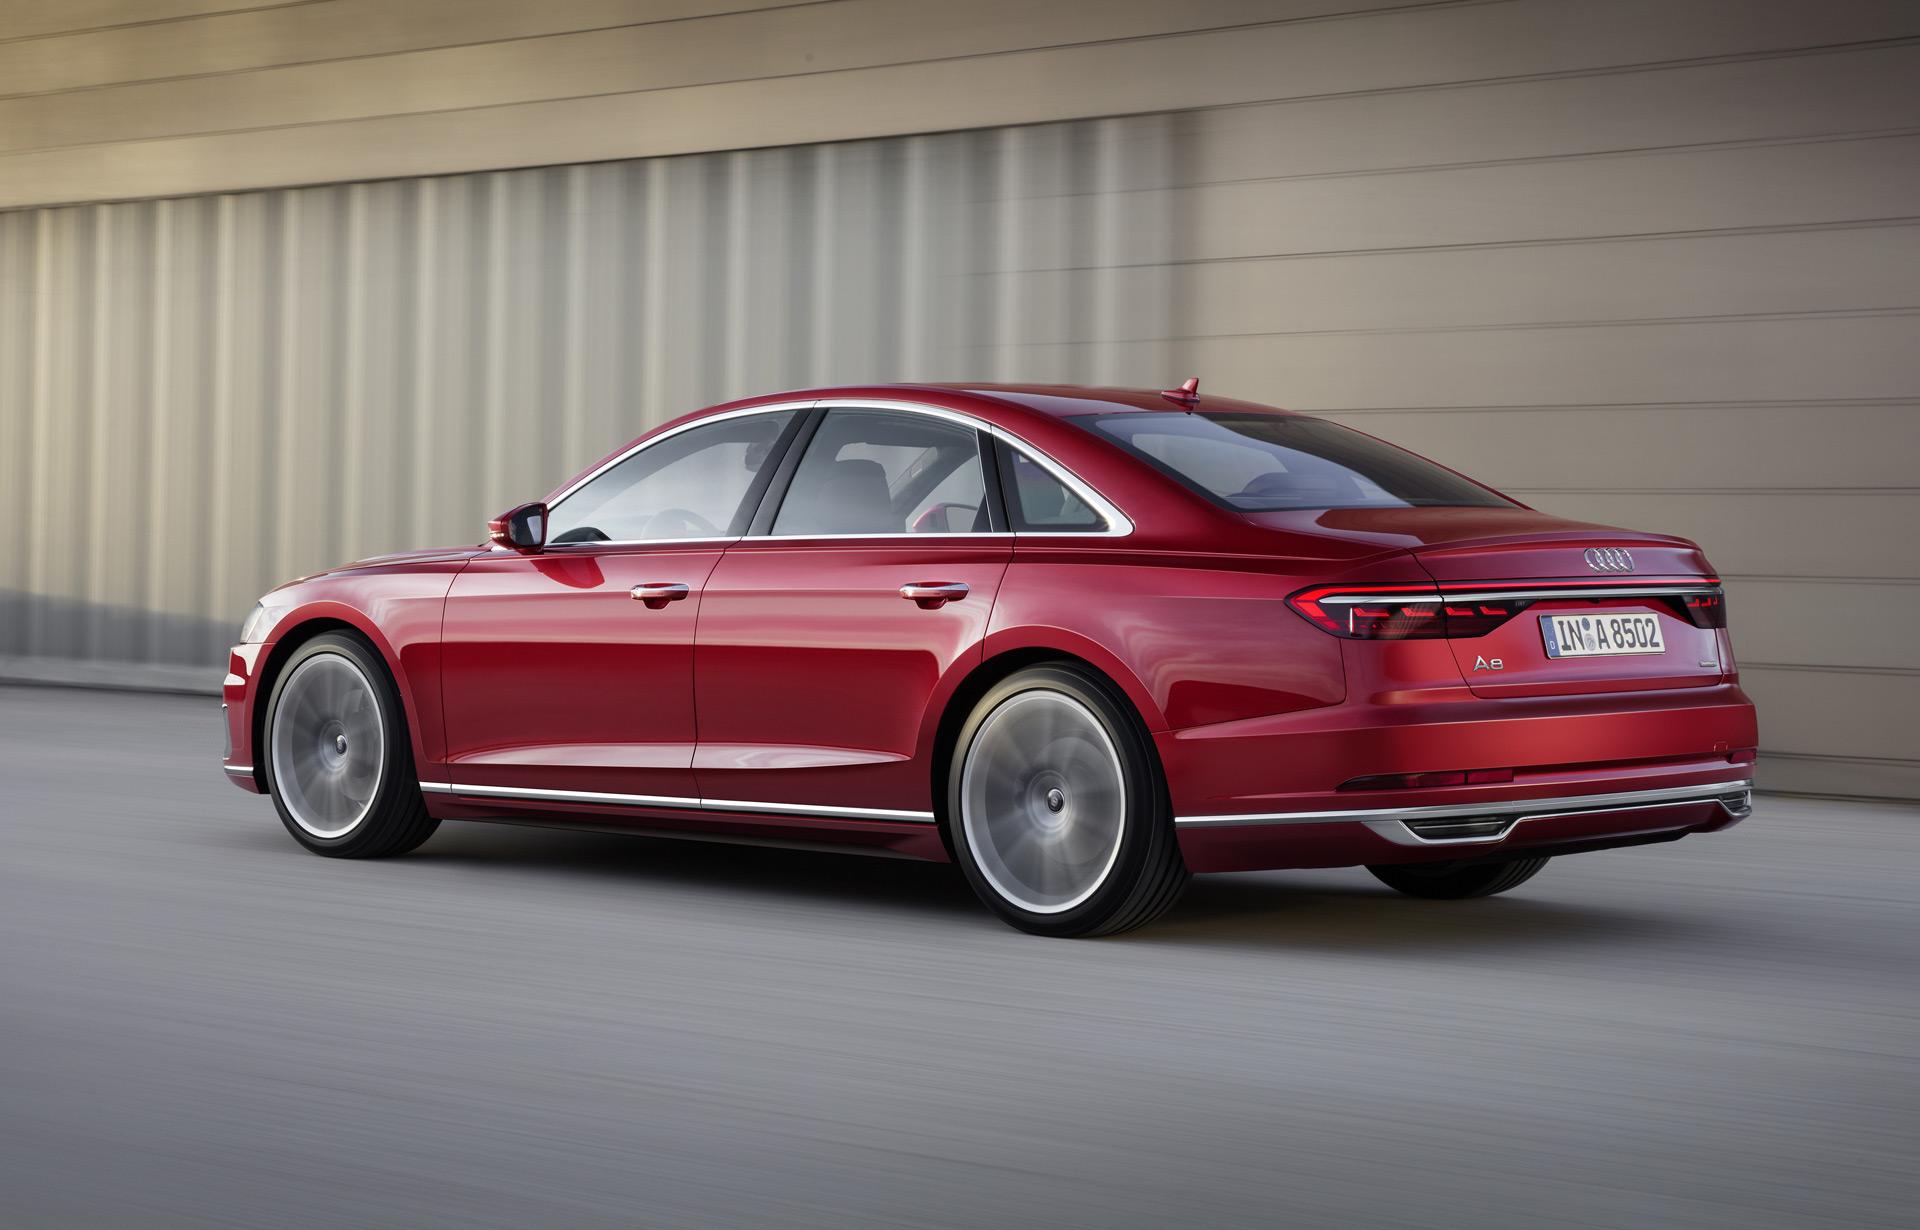 2020 Wrx Sti >> Report: Next Audi S8 Plus to borrow Porsche Panamera Turbo S E-Hybrid's plug-in powertrain